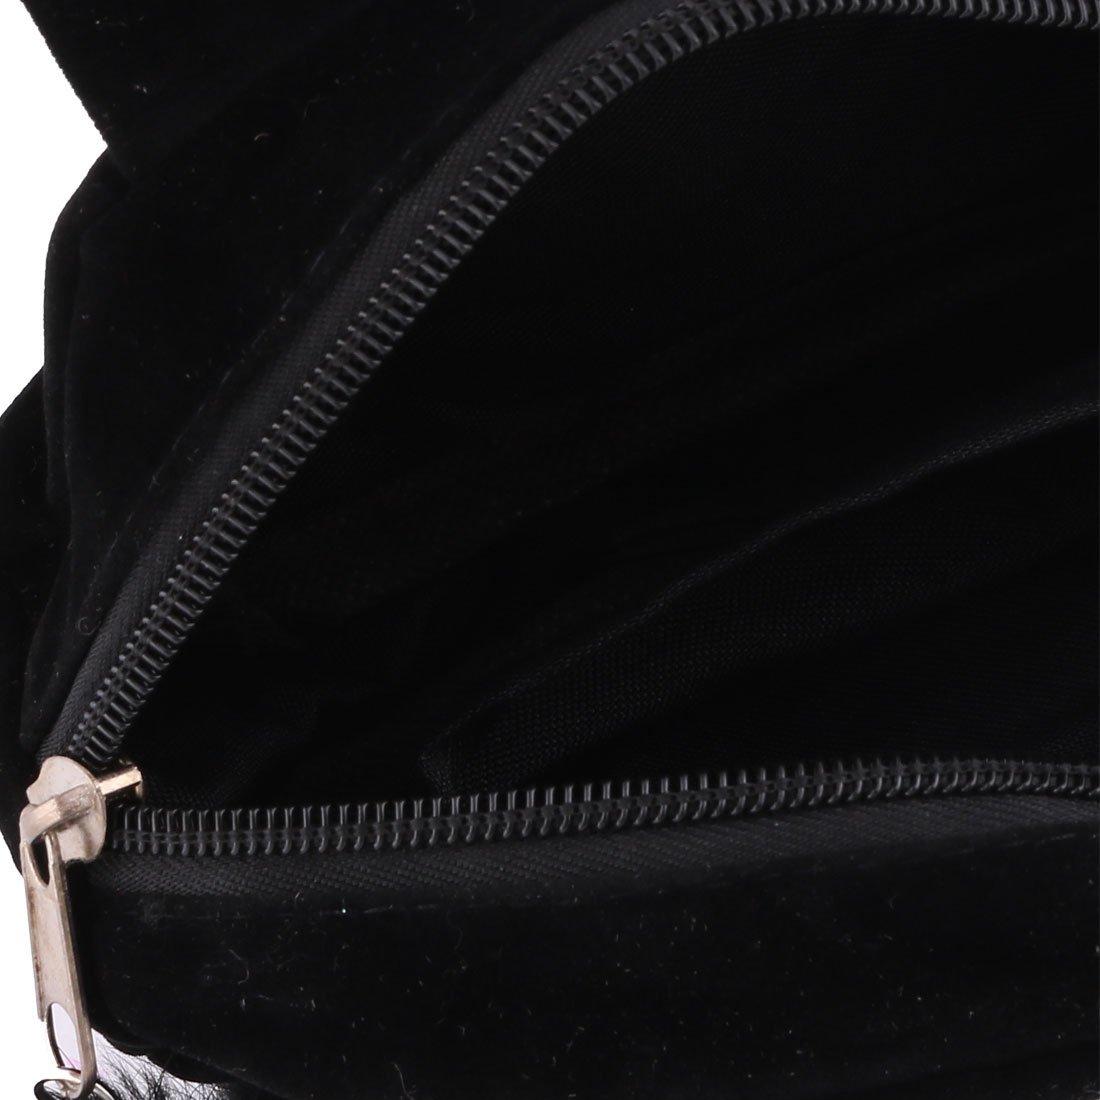 Amazon.com: Maquillaje eDealMax terciopelo Señora del gato Diseño cosmético del bolso de embrague Organizador 2pcs Negro Fucsia: Health & Personal Care